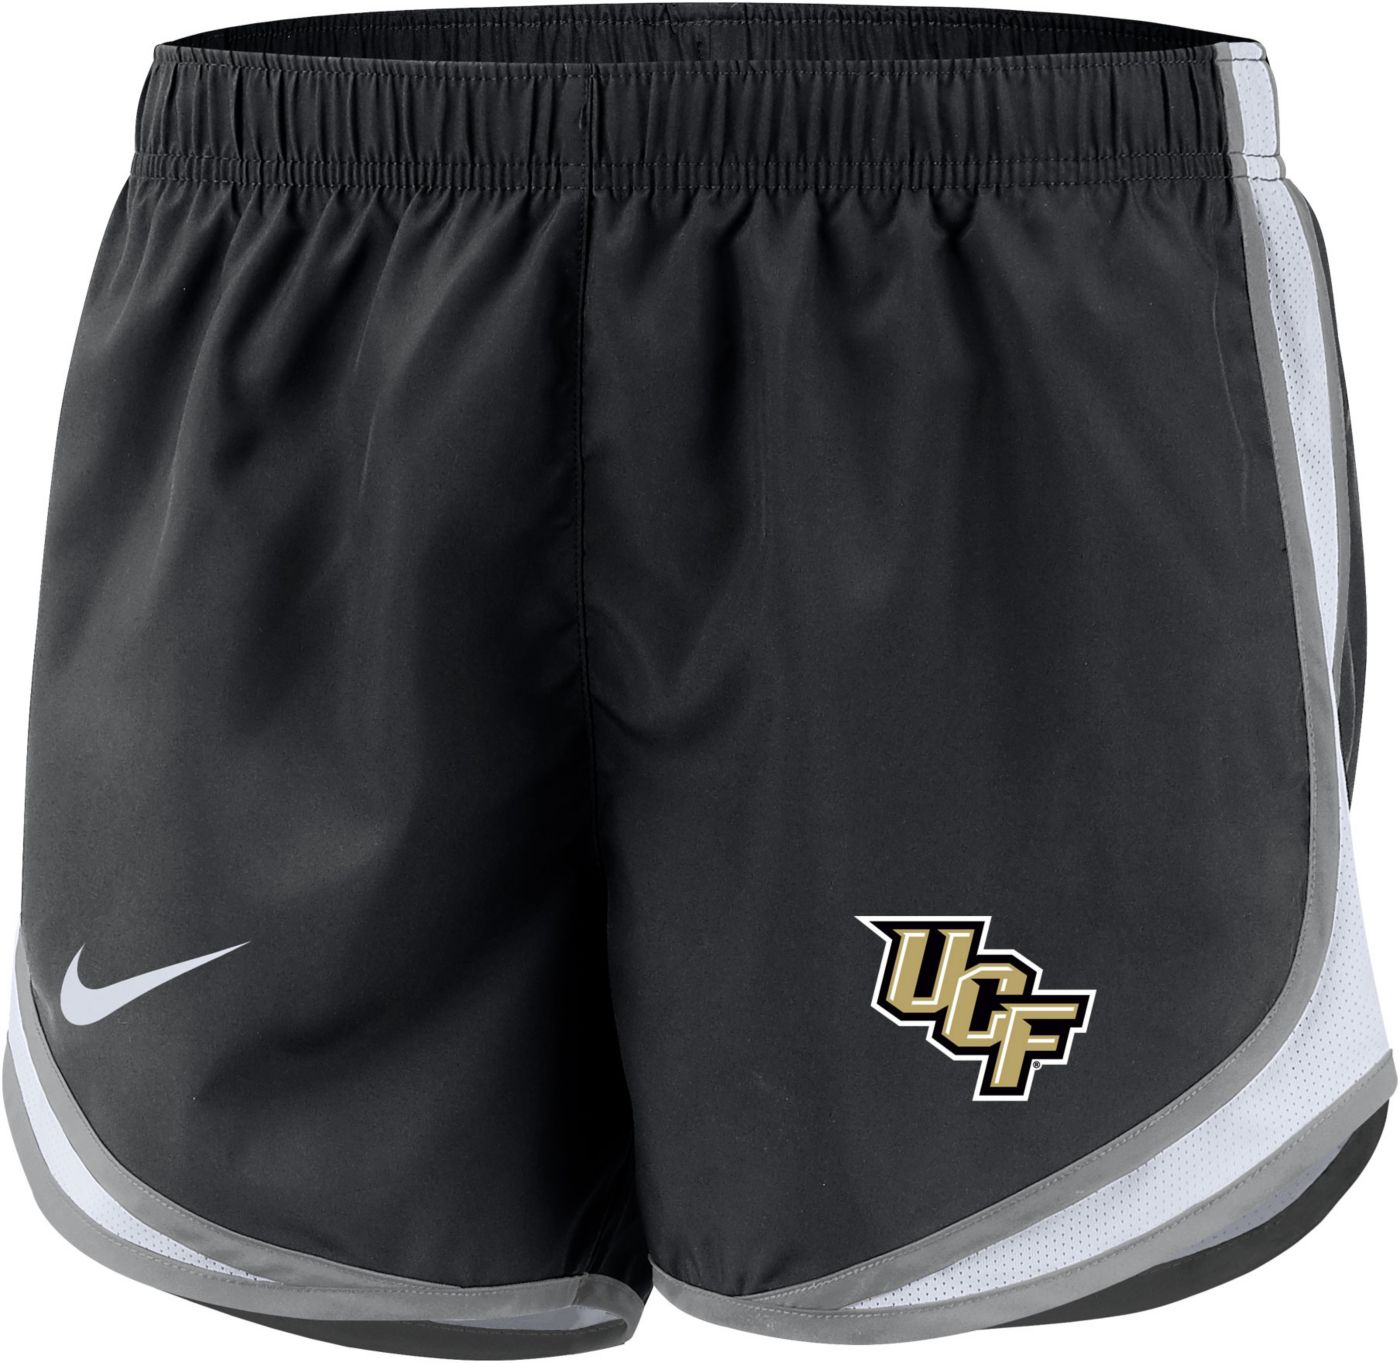 Nike Women's UCF Knights Dri-FIT Tempo Black Shorts